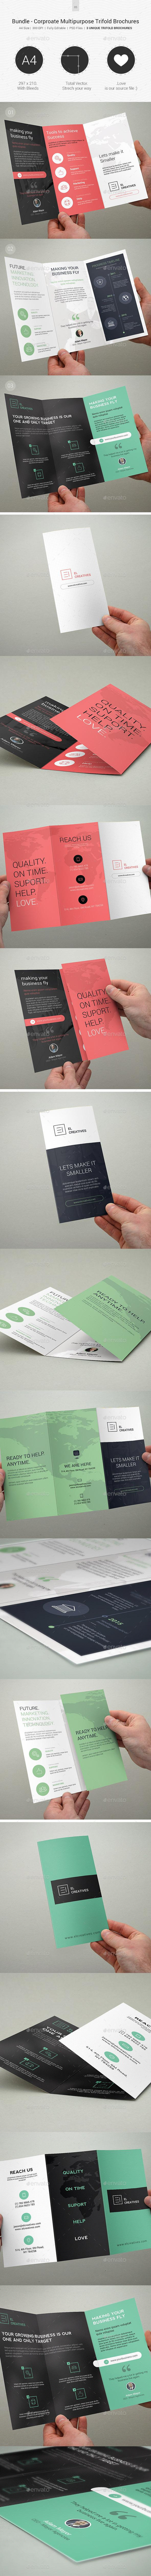 Bundle - Corporate Trifold Brochures - 05 - Corporate Brochures